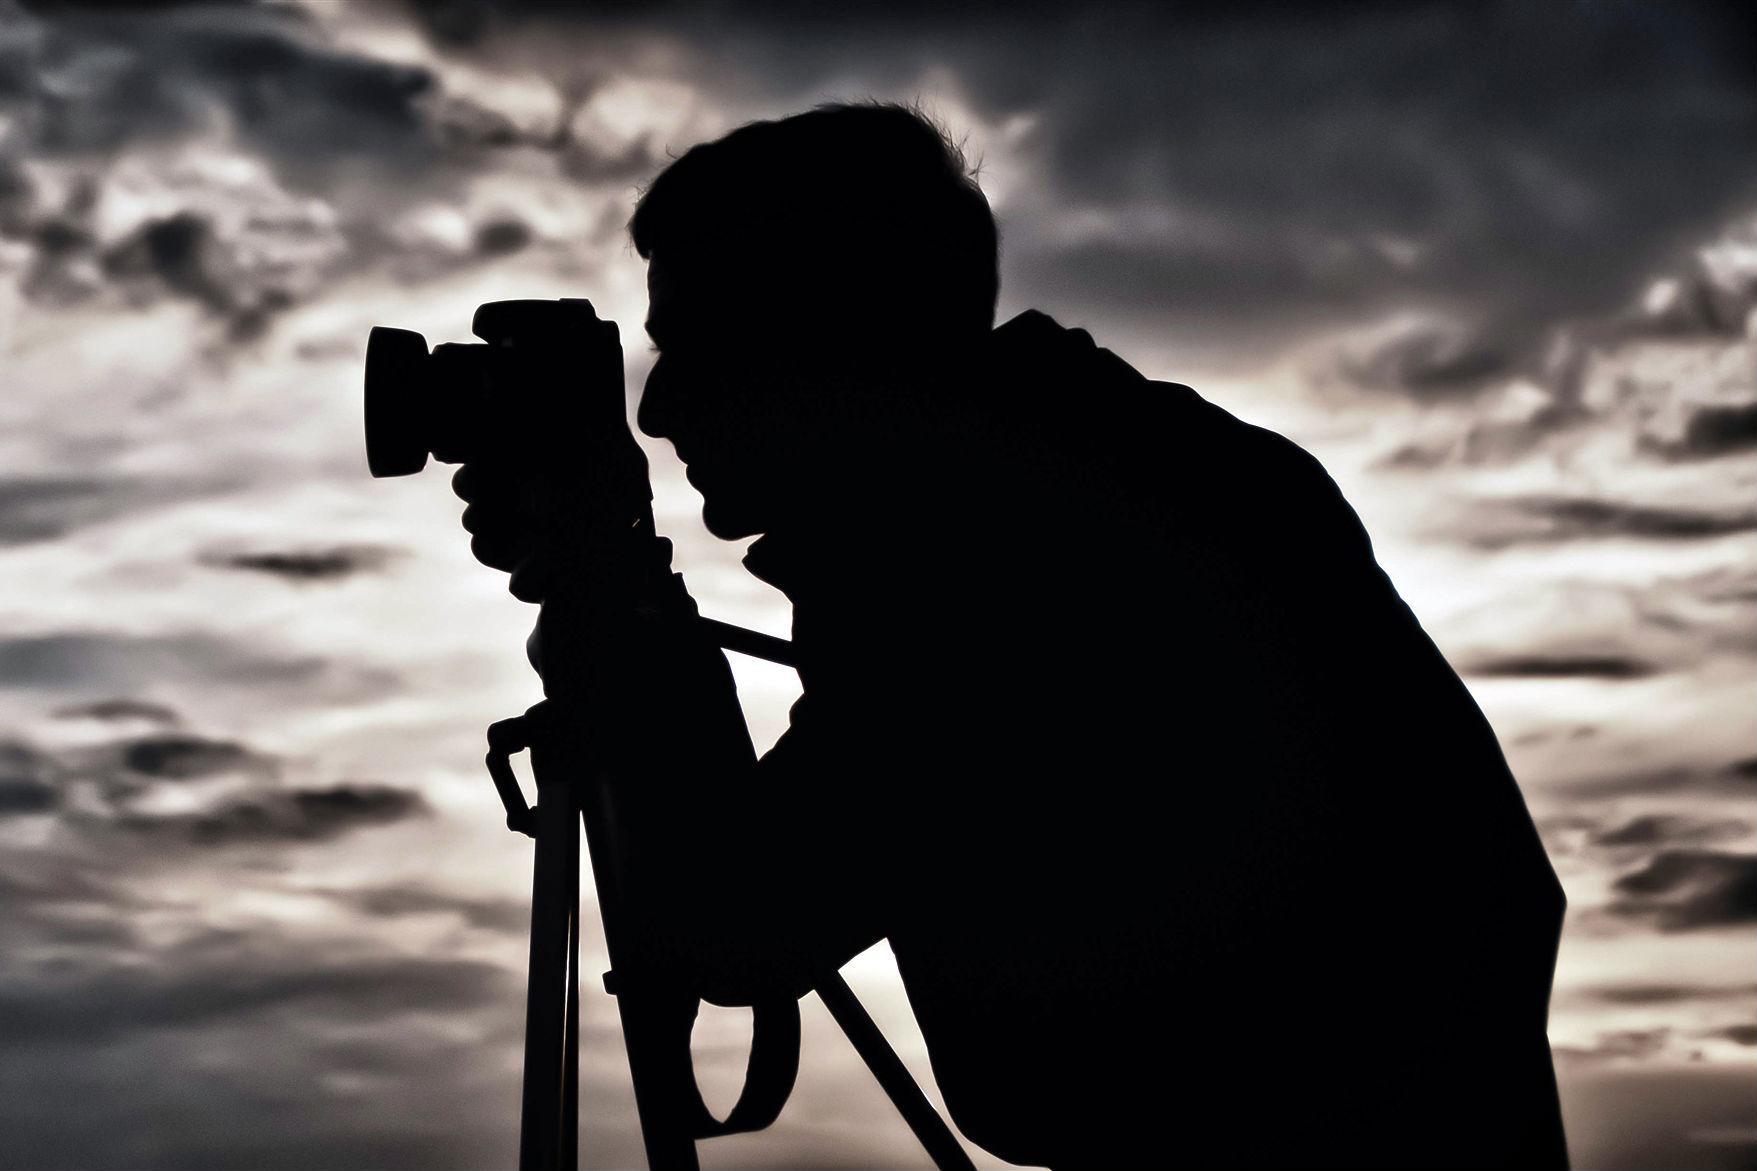 Photograph #